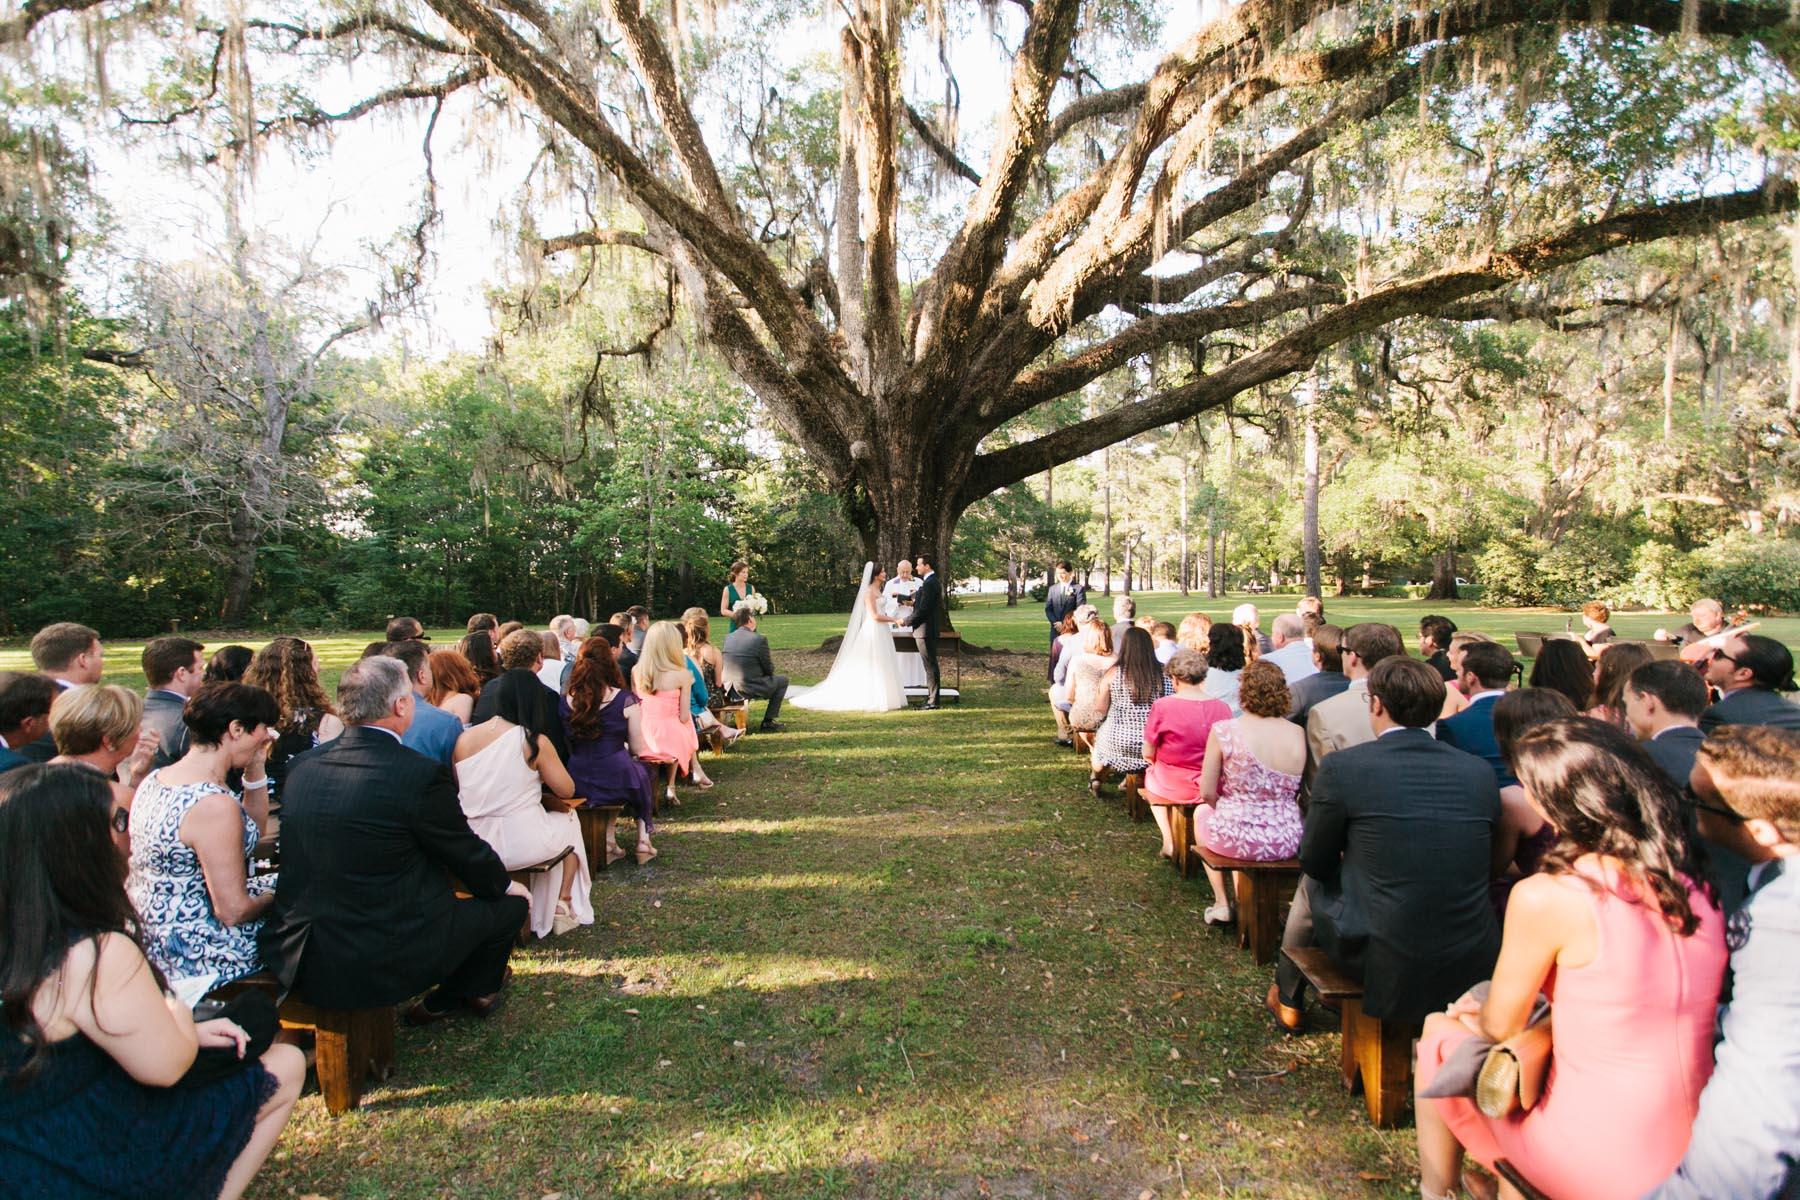 lowry wedding blog eden garden florida wedding-64